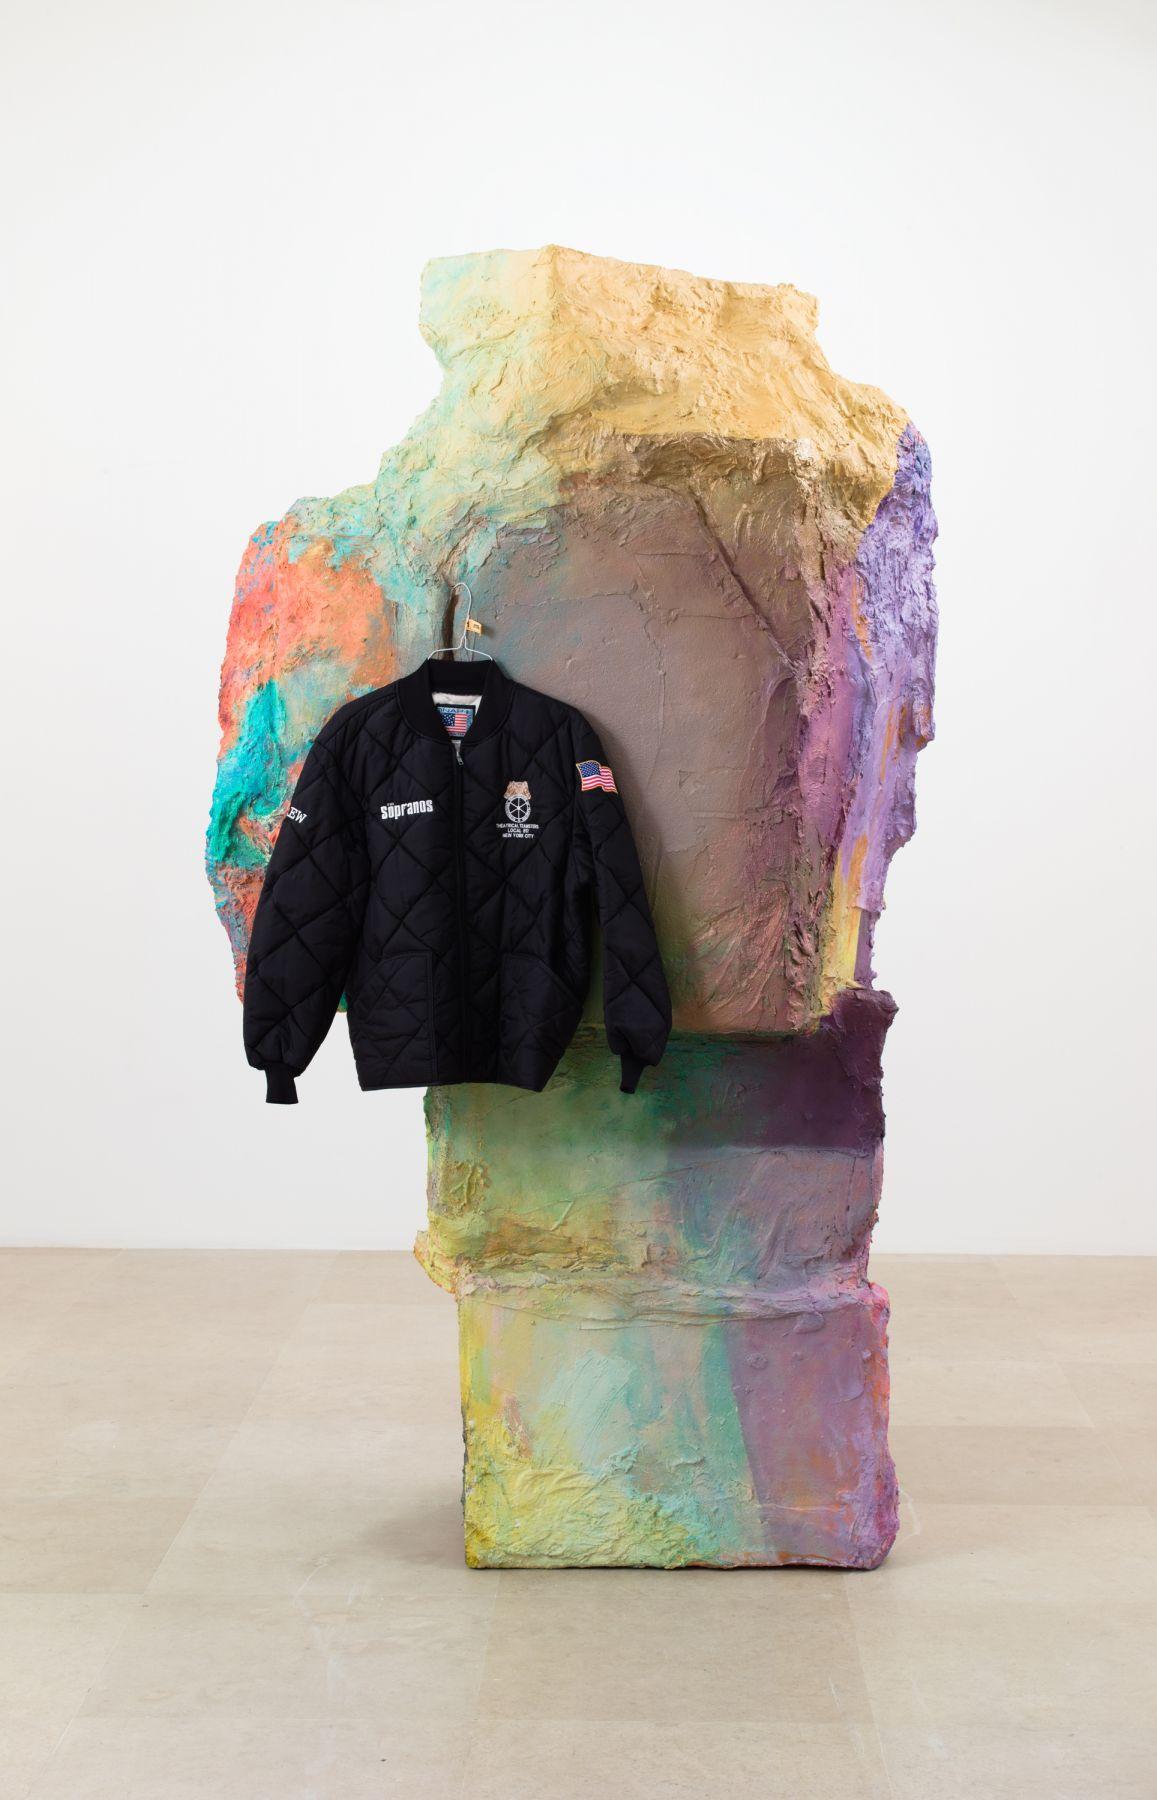 Rachel Harrison American Bar, 2014 Wood, polystyrene, cardboard, cement, acrylic, jacket, hanger, and kitchen scrubber 92 x 53 x 28 inches (233.7 x 134.6 x 71.1 cm)